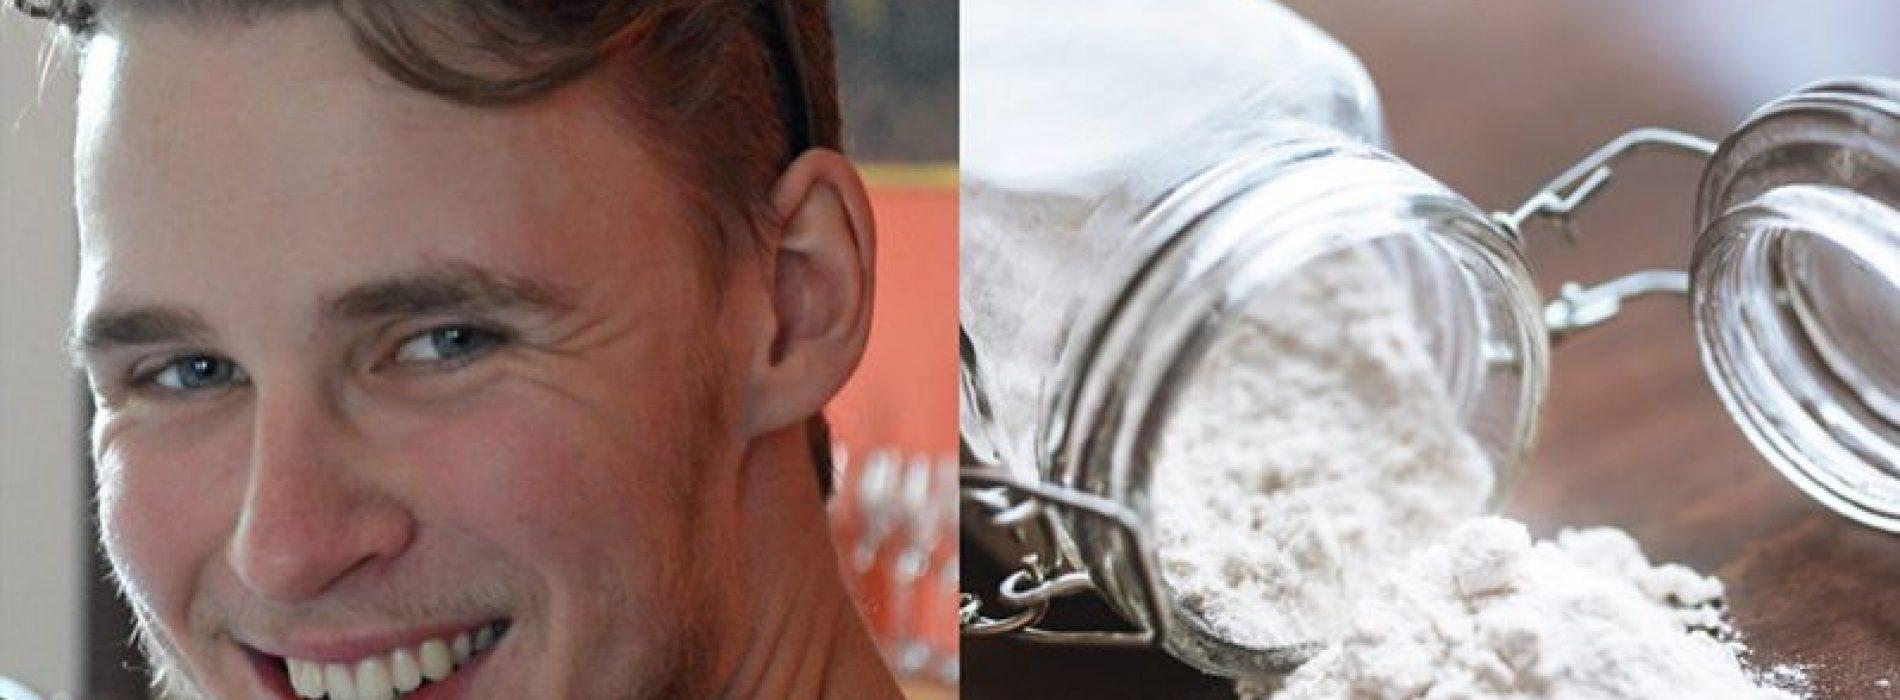 Waarschuwing man sterft na een theelepel cafeïnepoeder in proteïne-shake